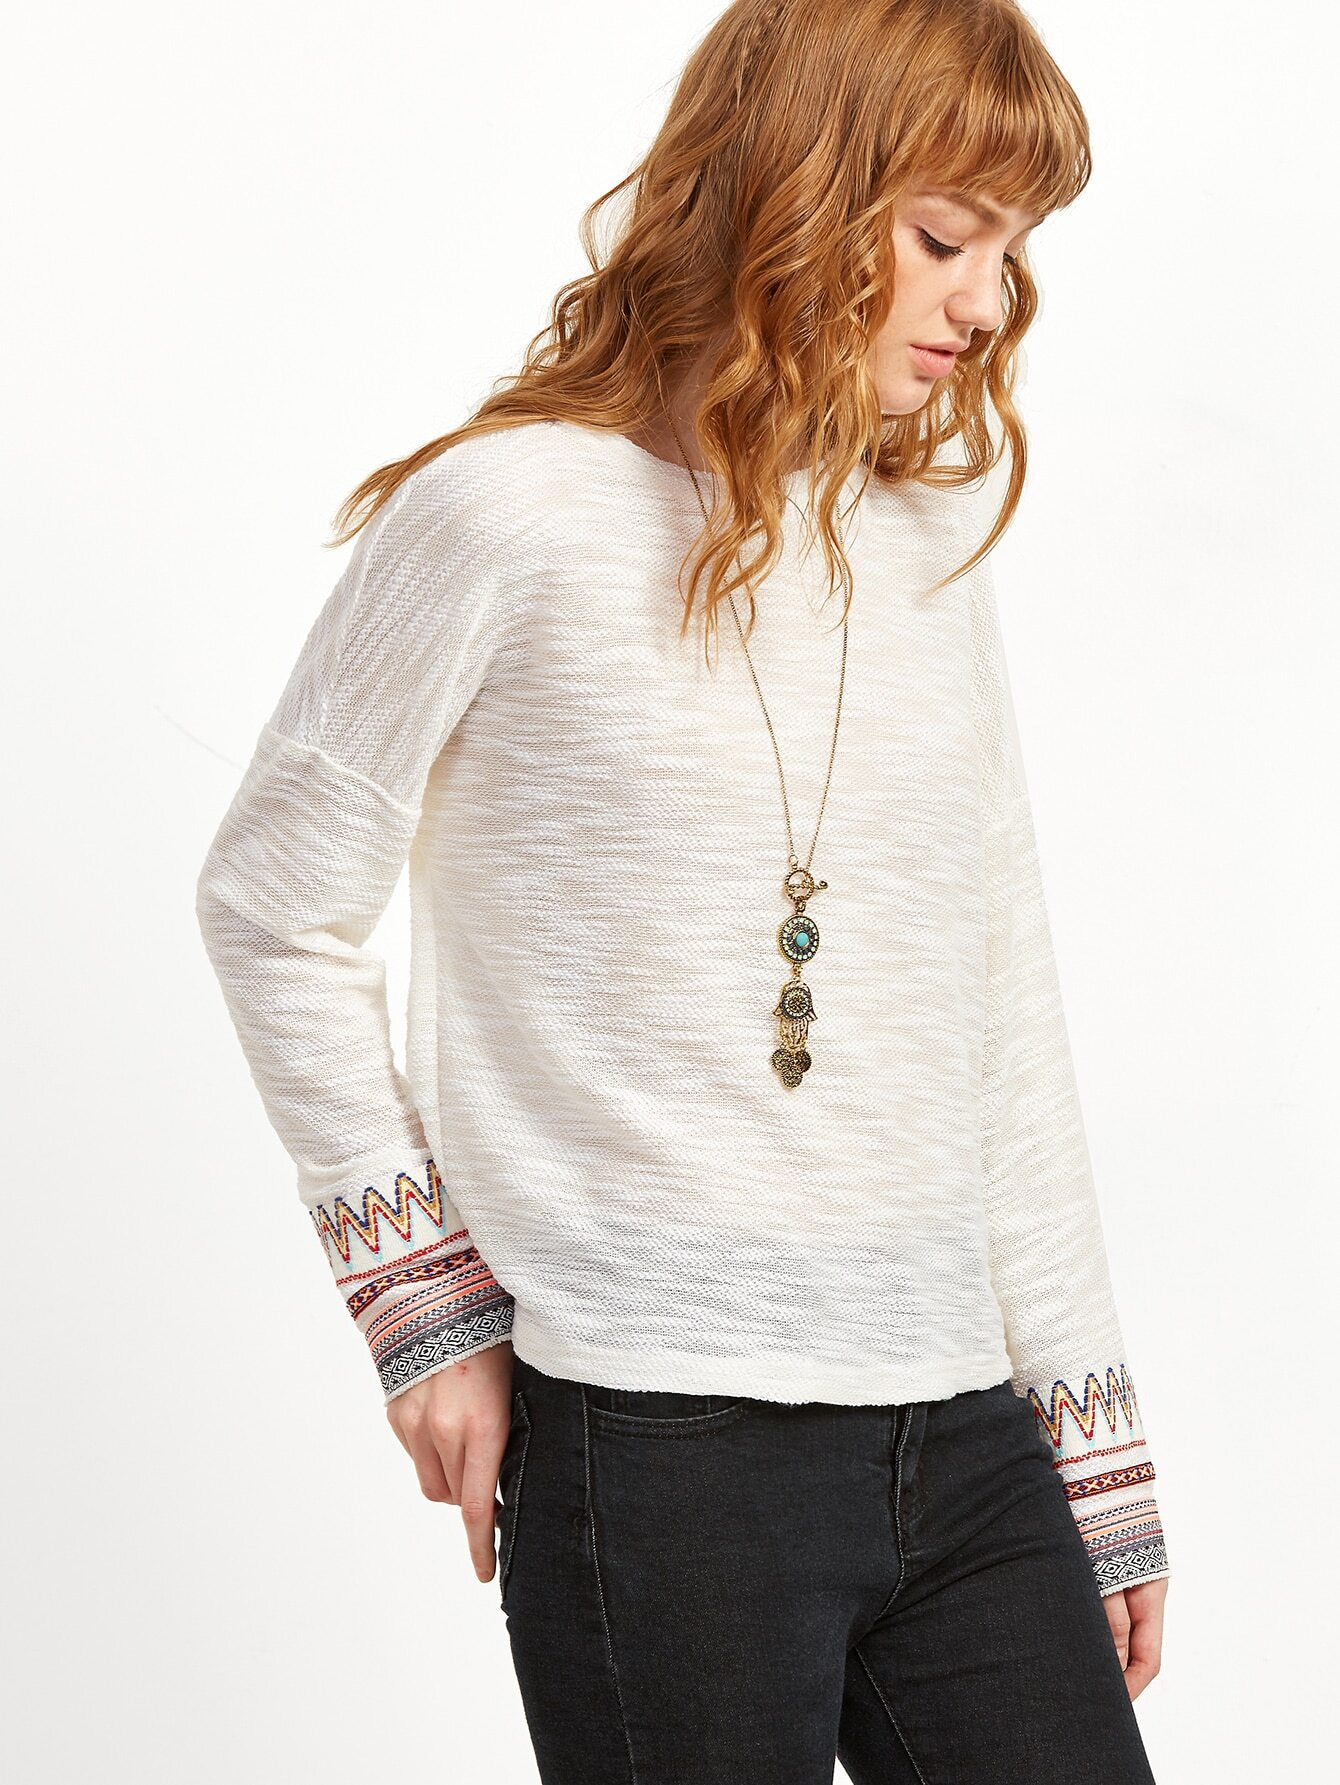 sweater160926701_2